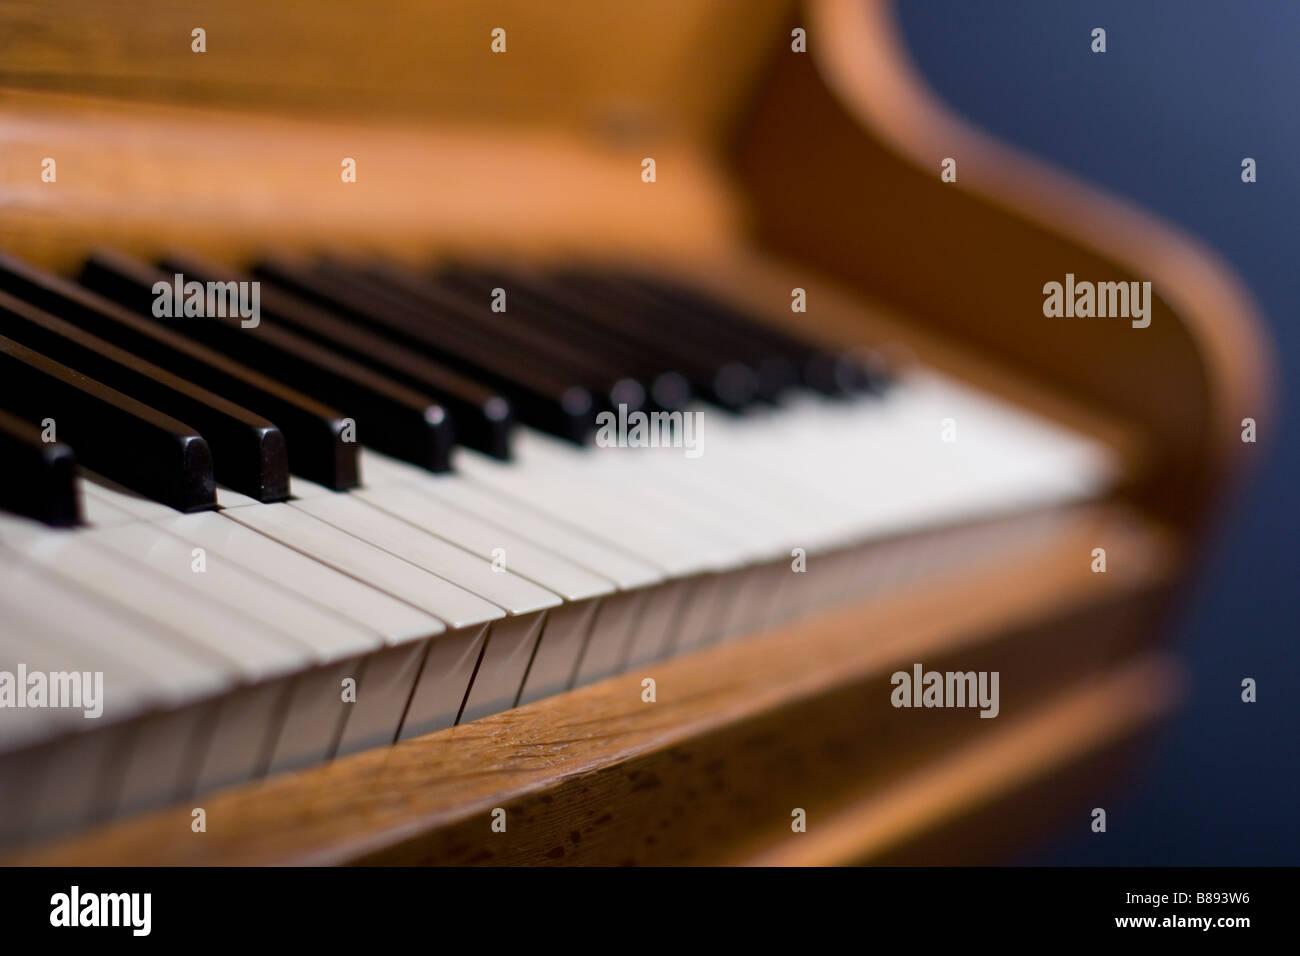 Piano narrow focus point on keys, single lamp as light source - Stock Image